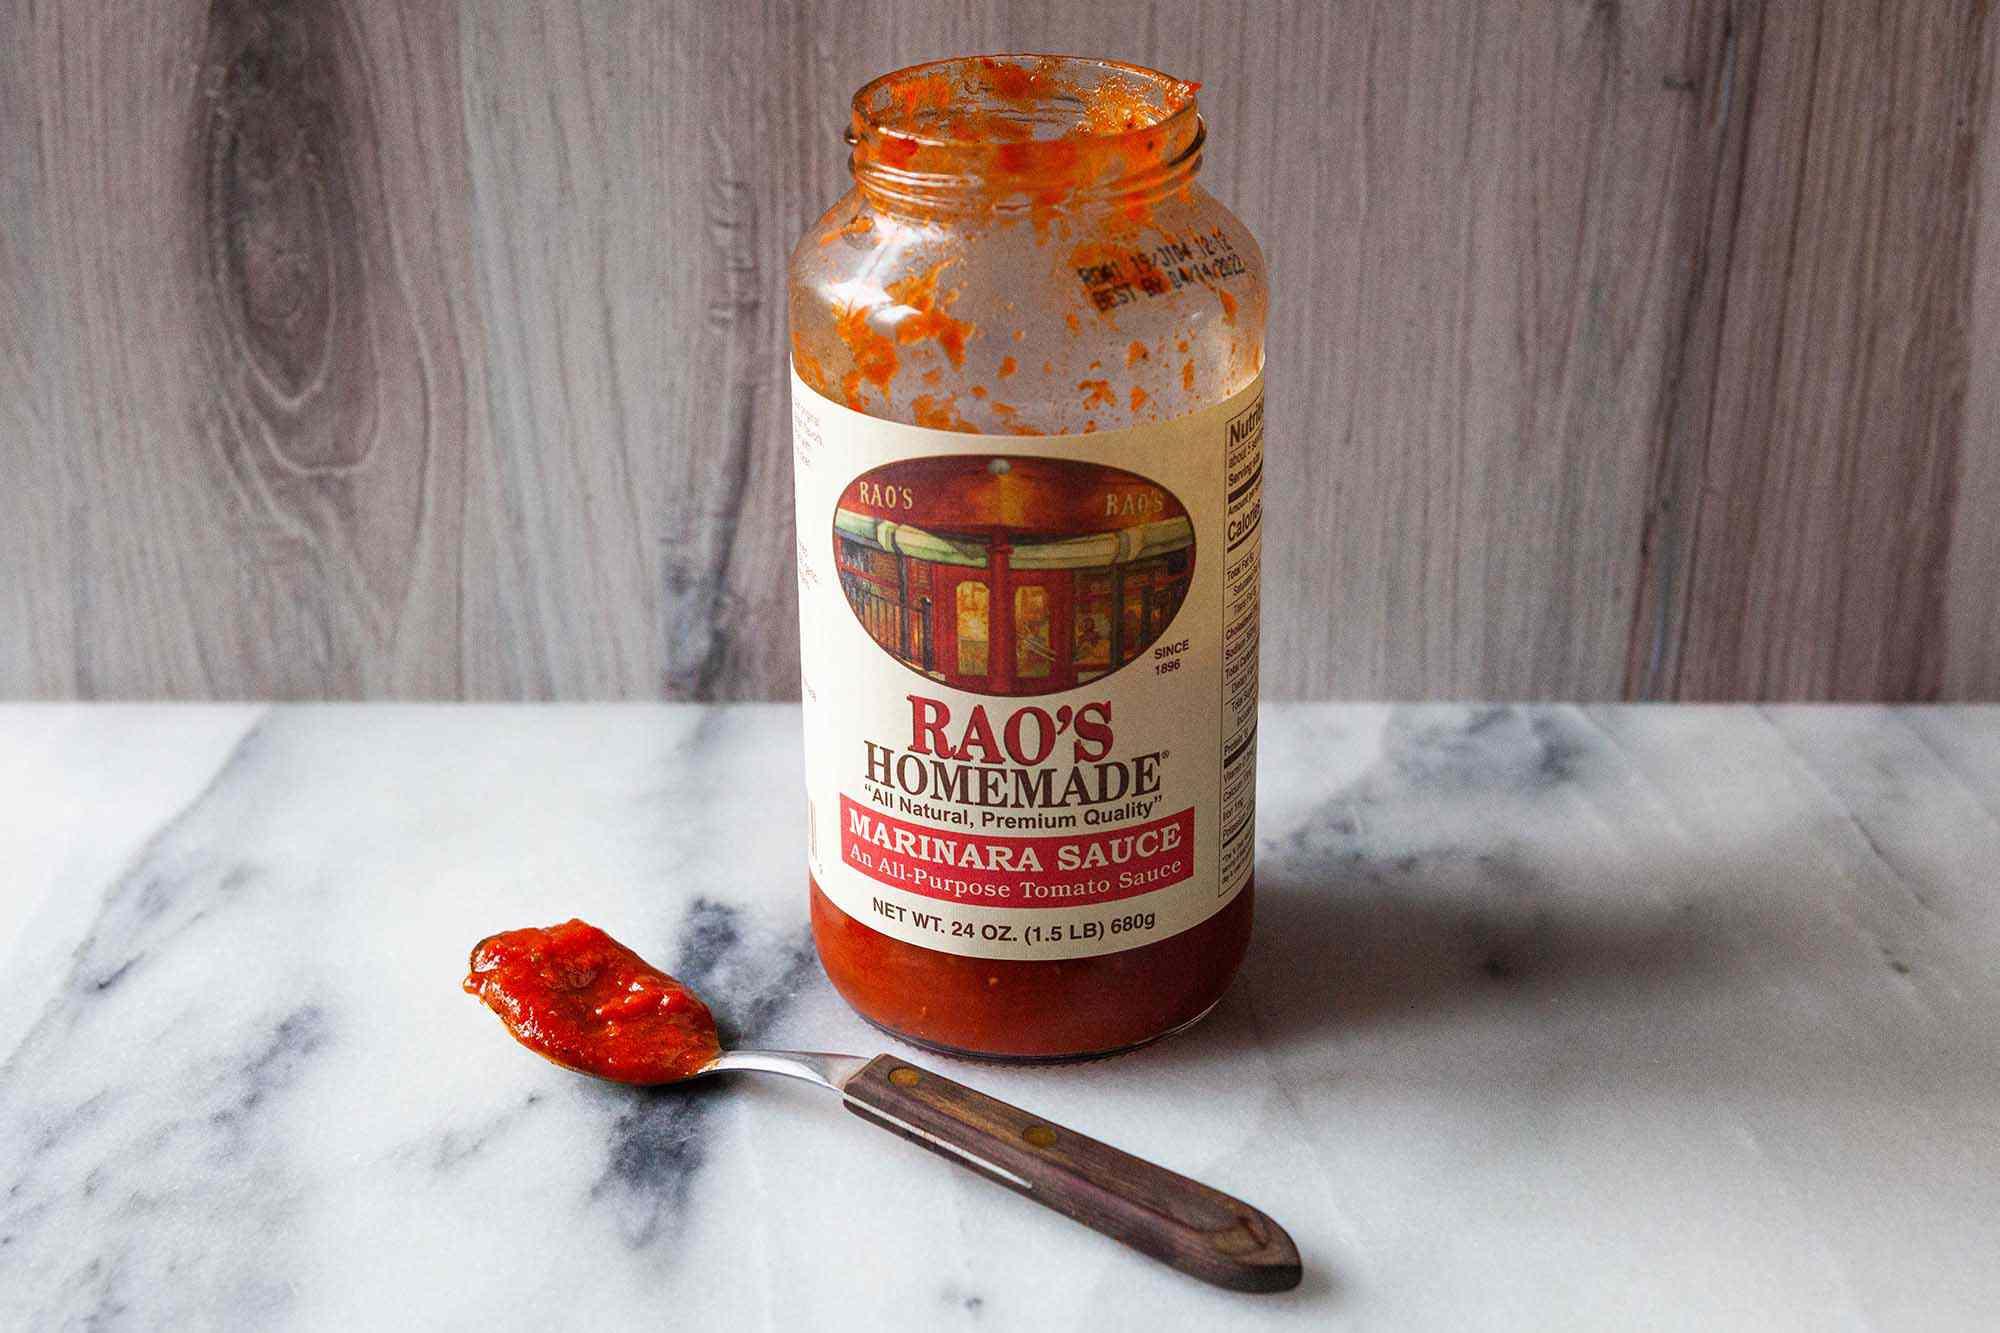 Rao's Homemade Tomato Sauce